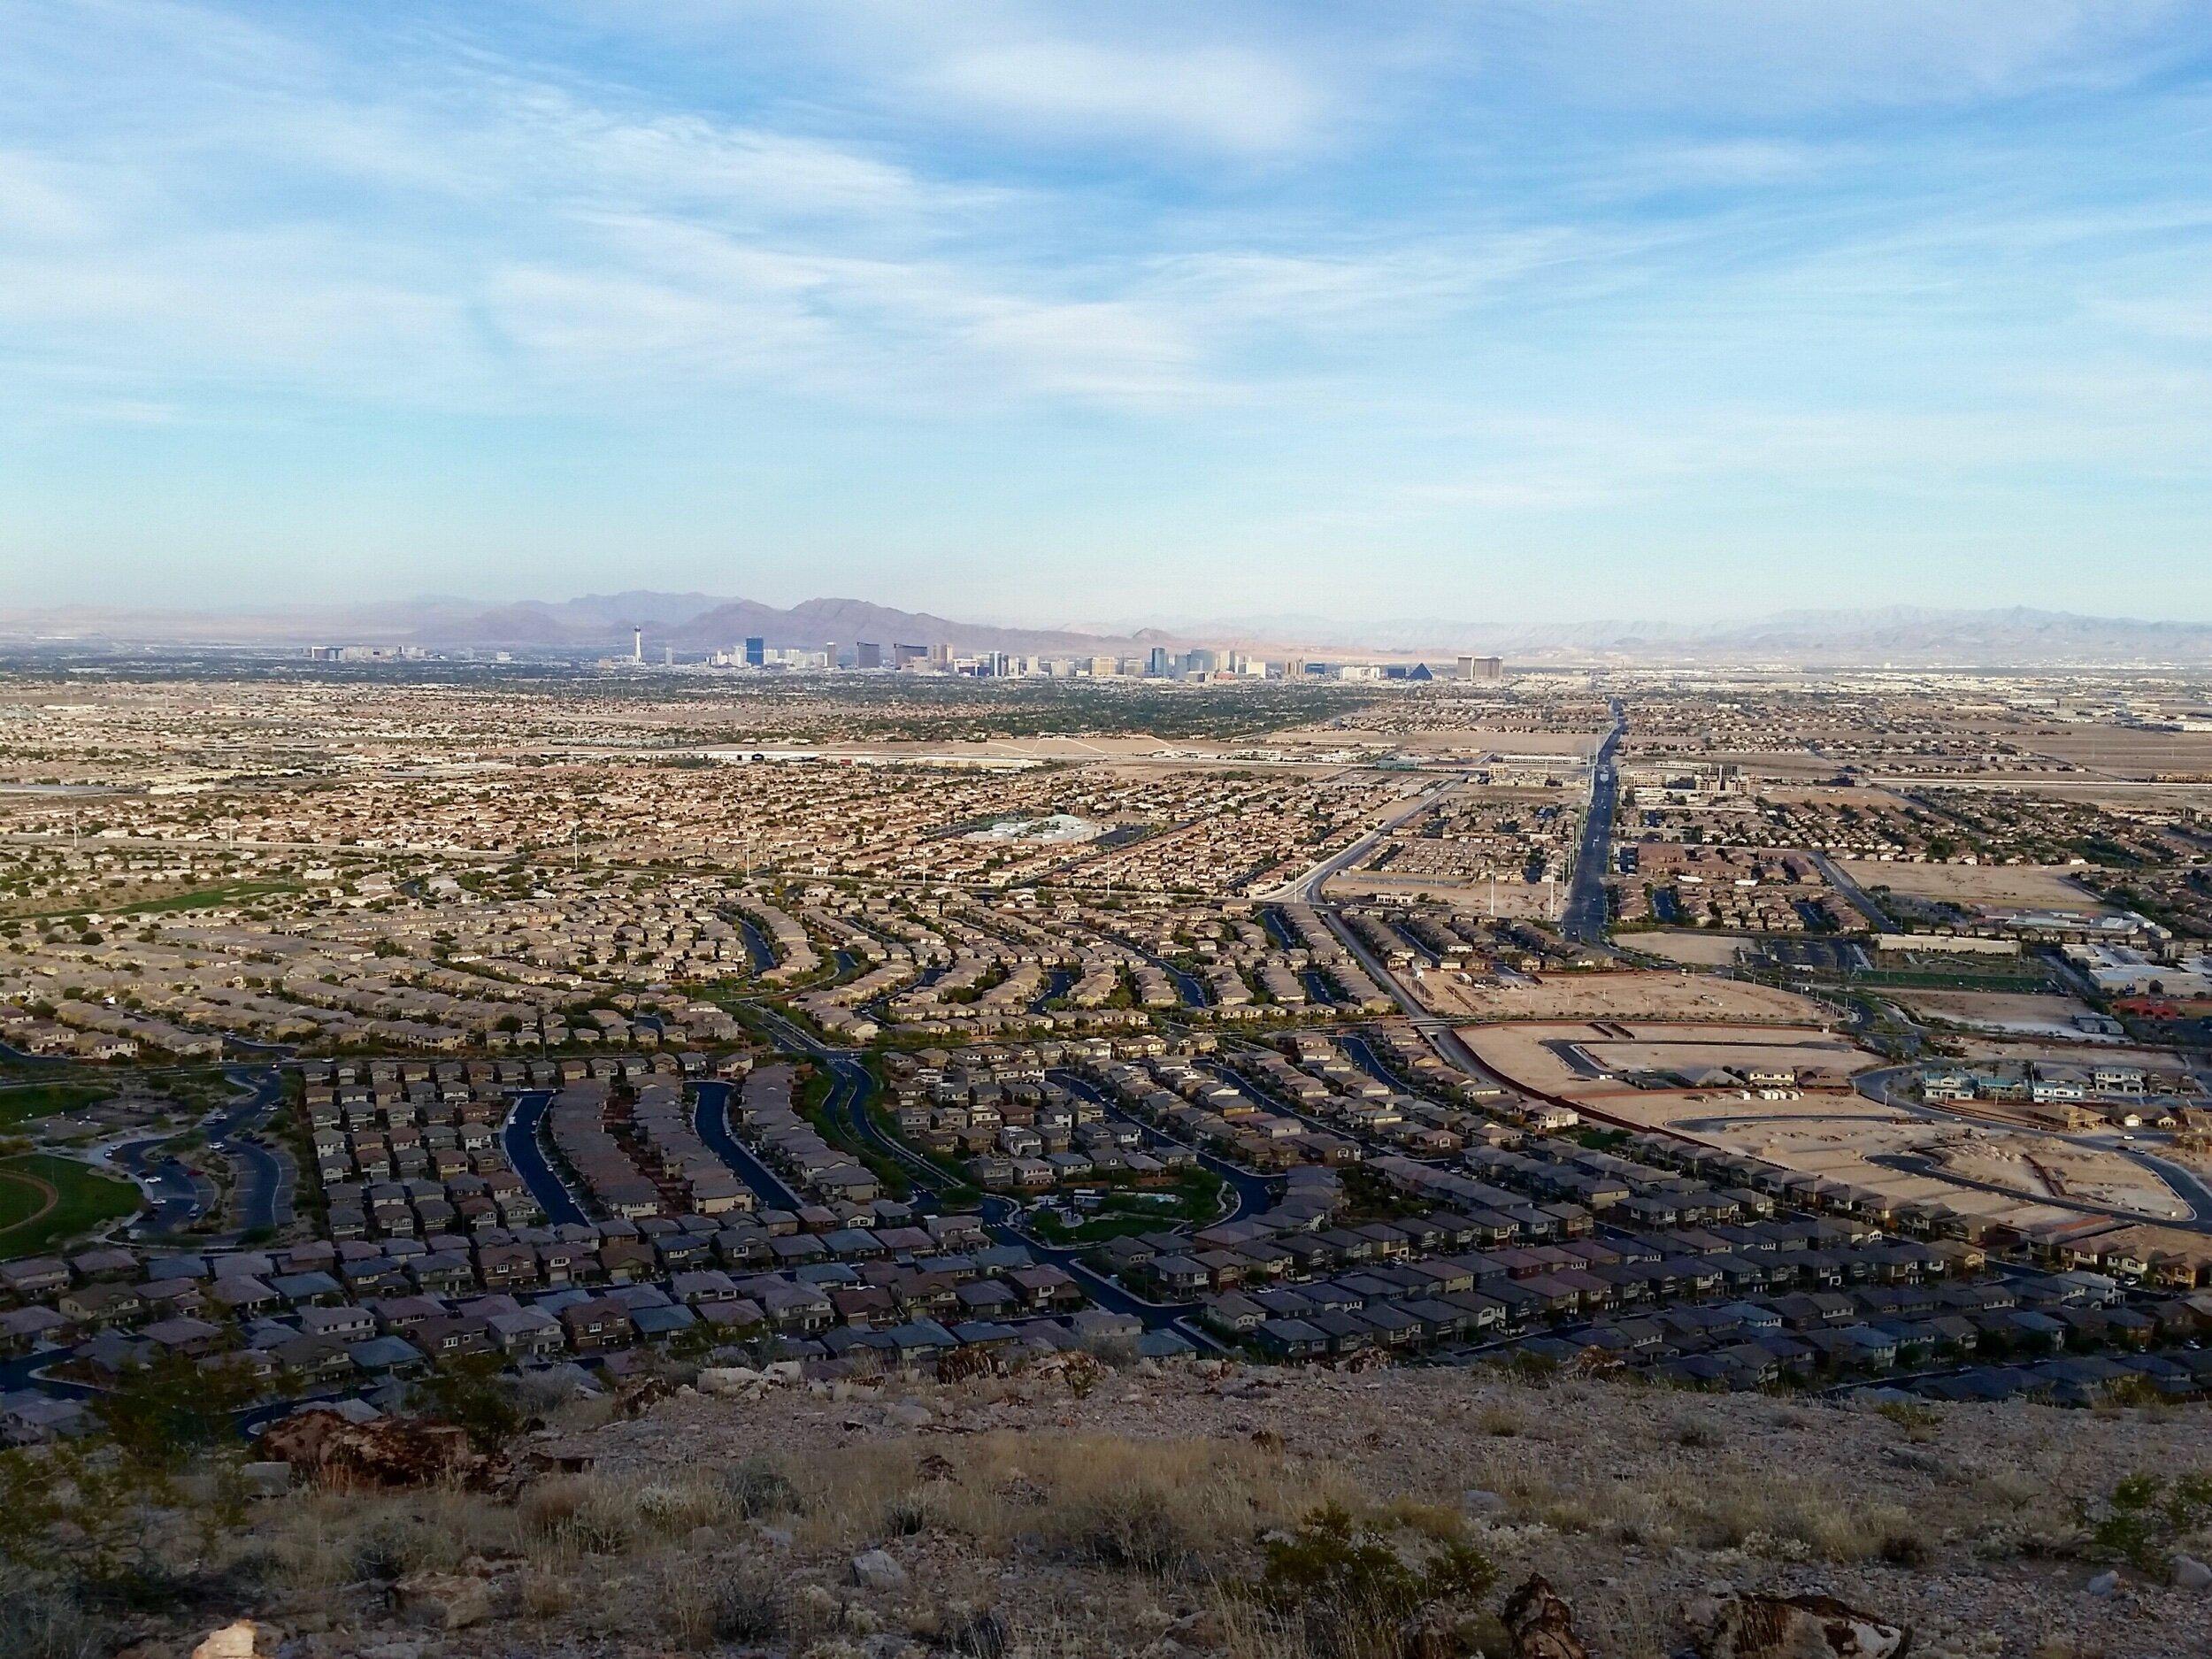 Overlooking the Las Vegas Valley (November 2014).